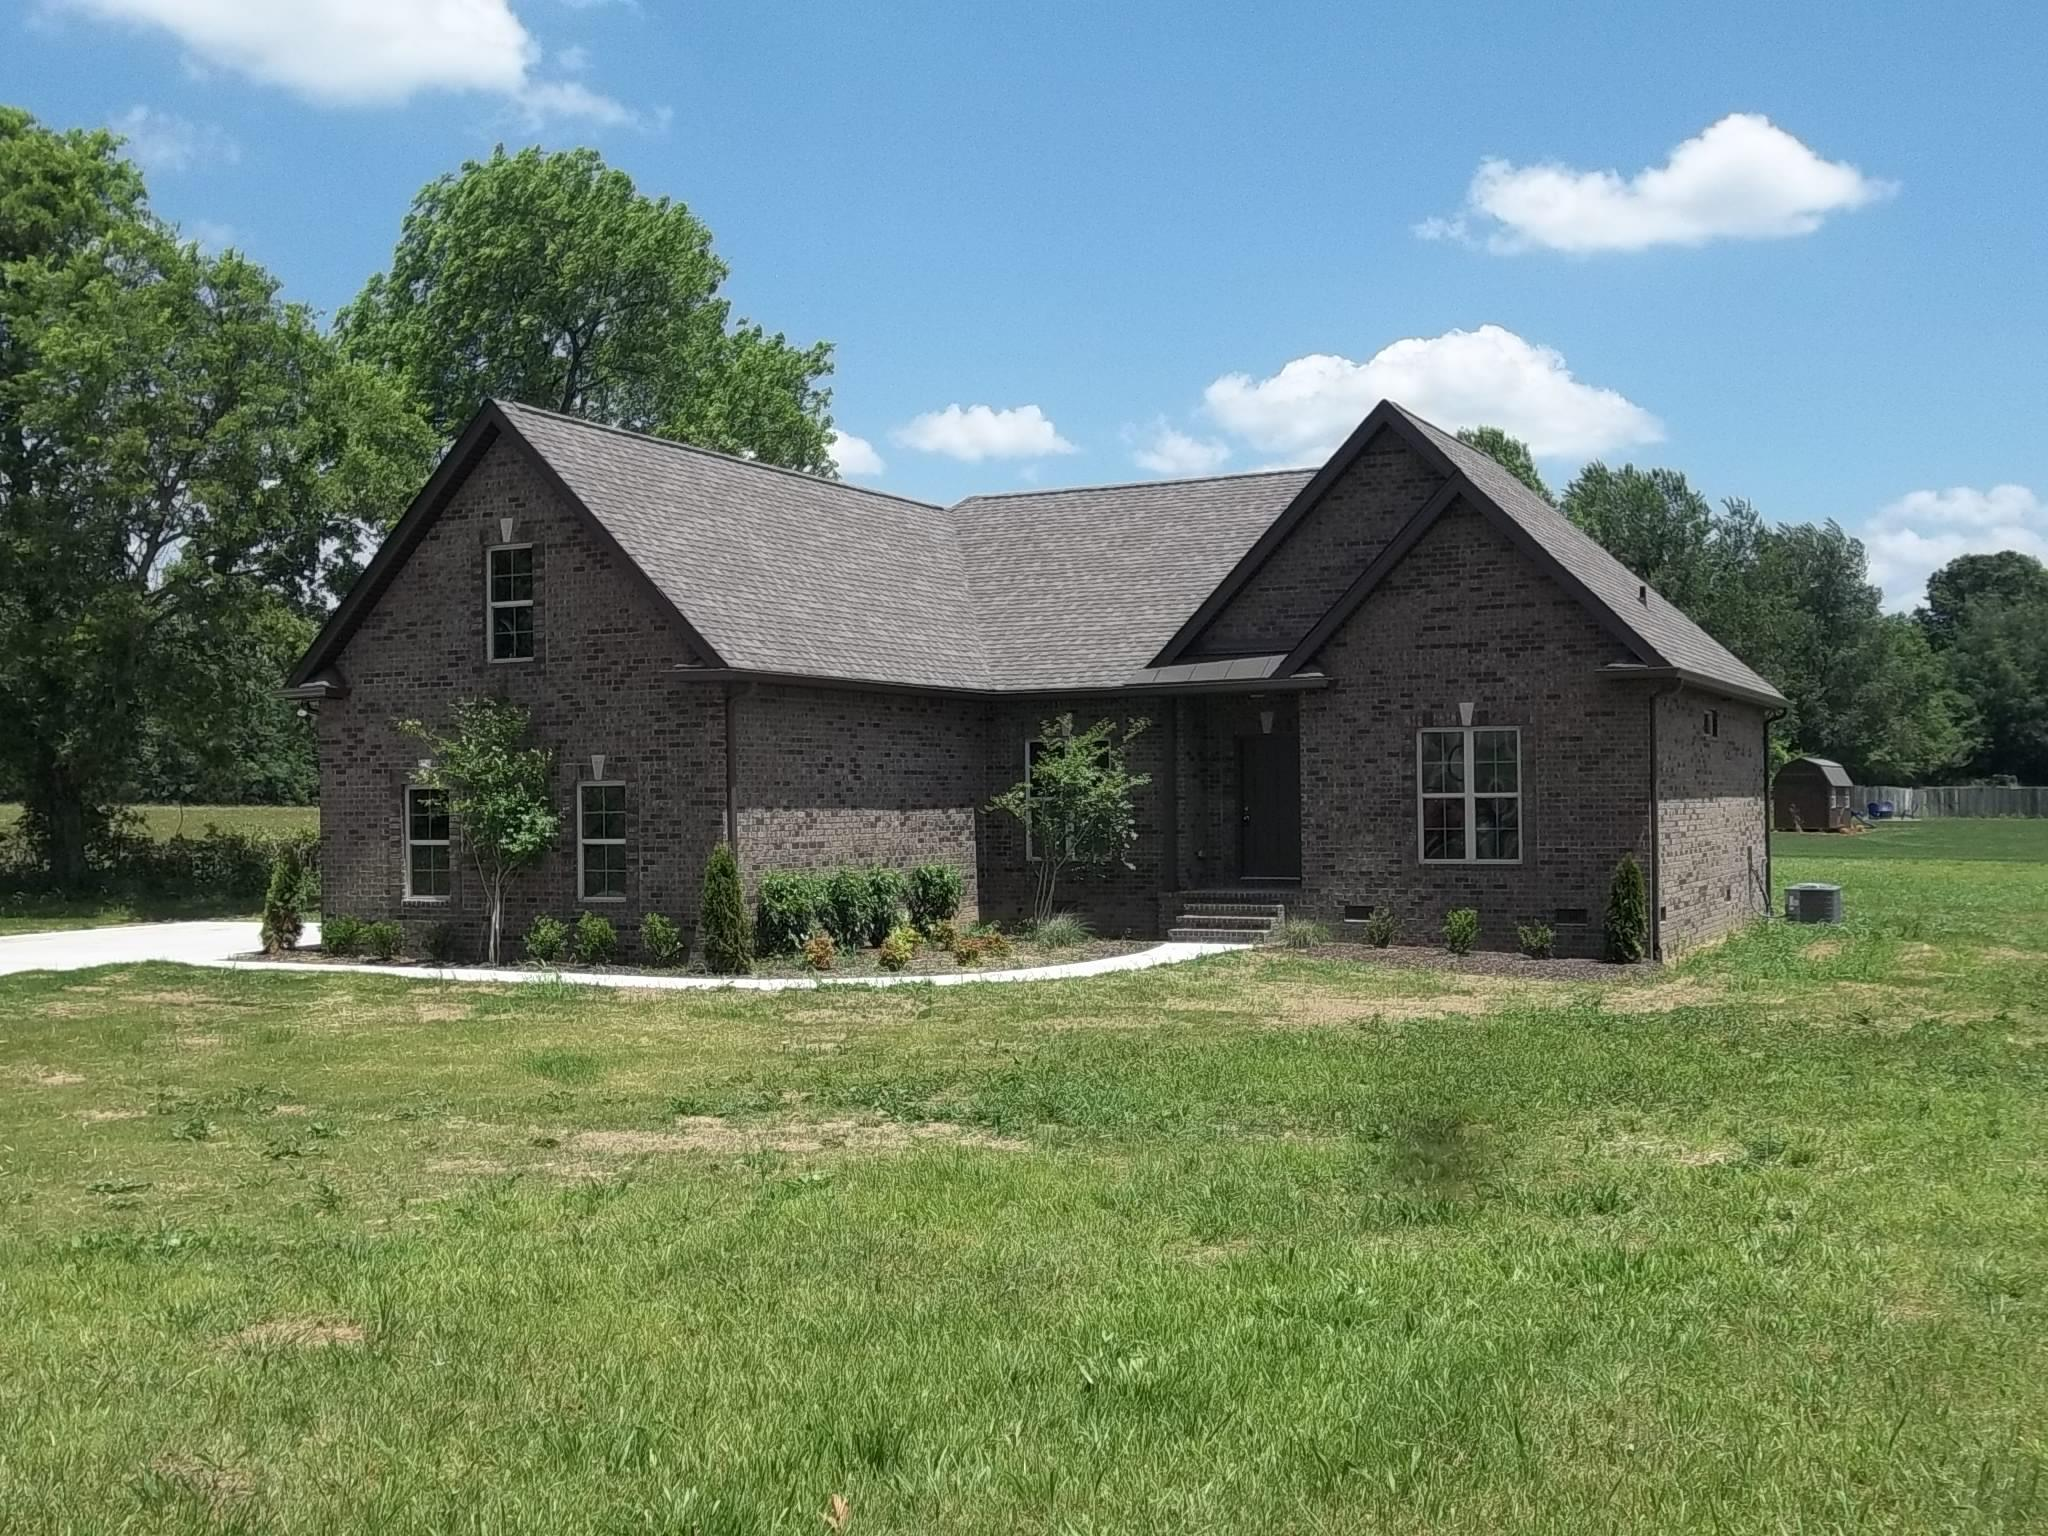 5650 Hwy. 231 S, Castalian Springs, TN 37031 - Castalian Springs, TN real estate listing